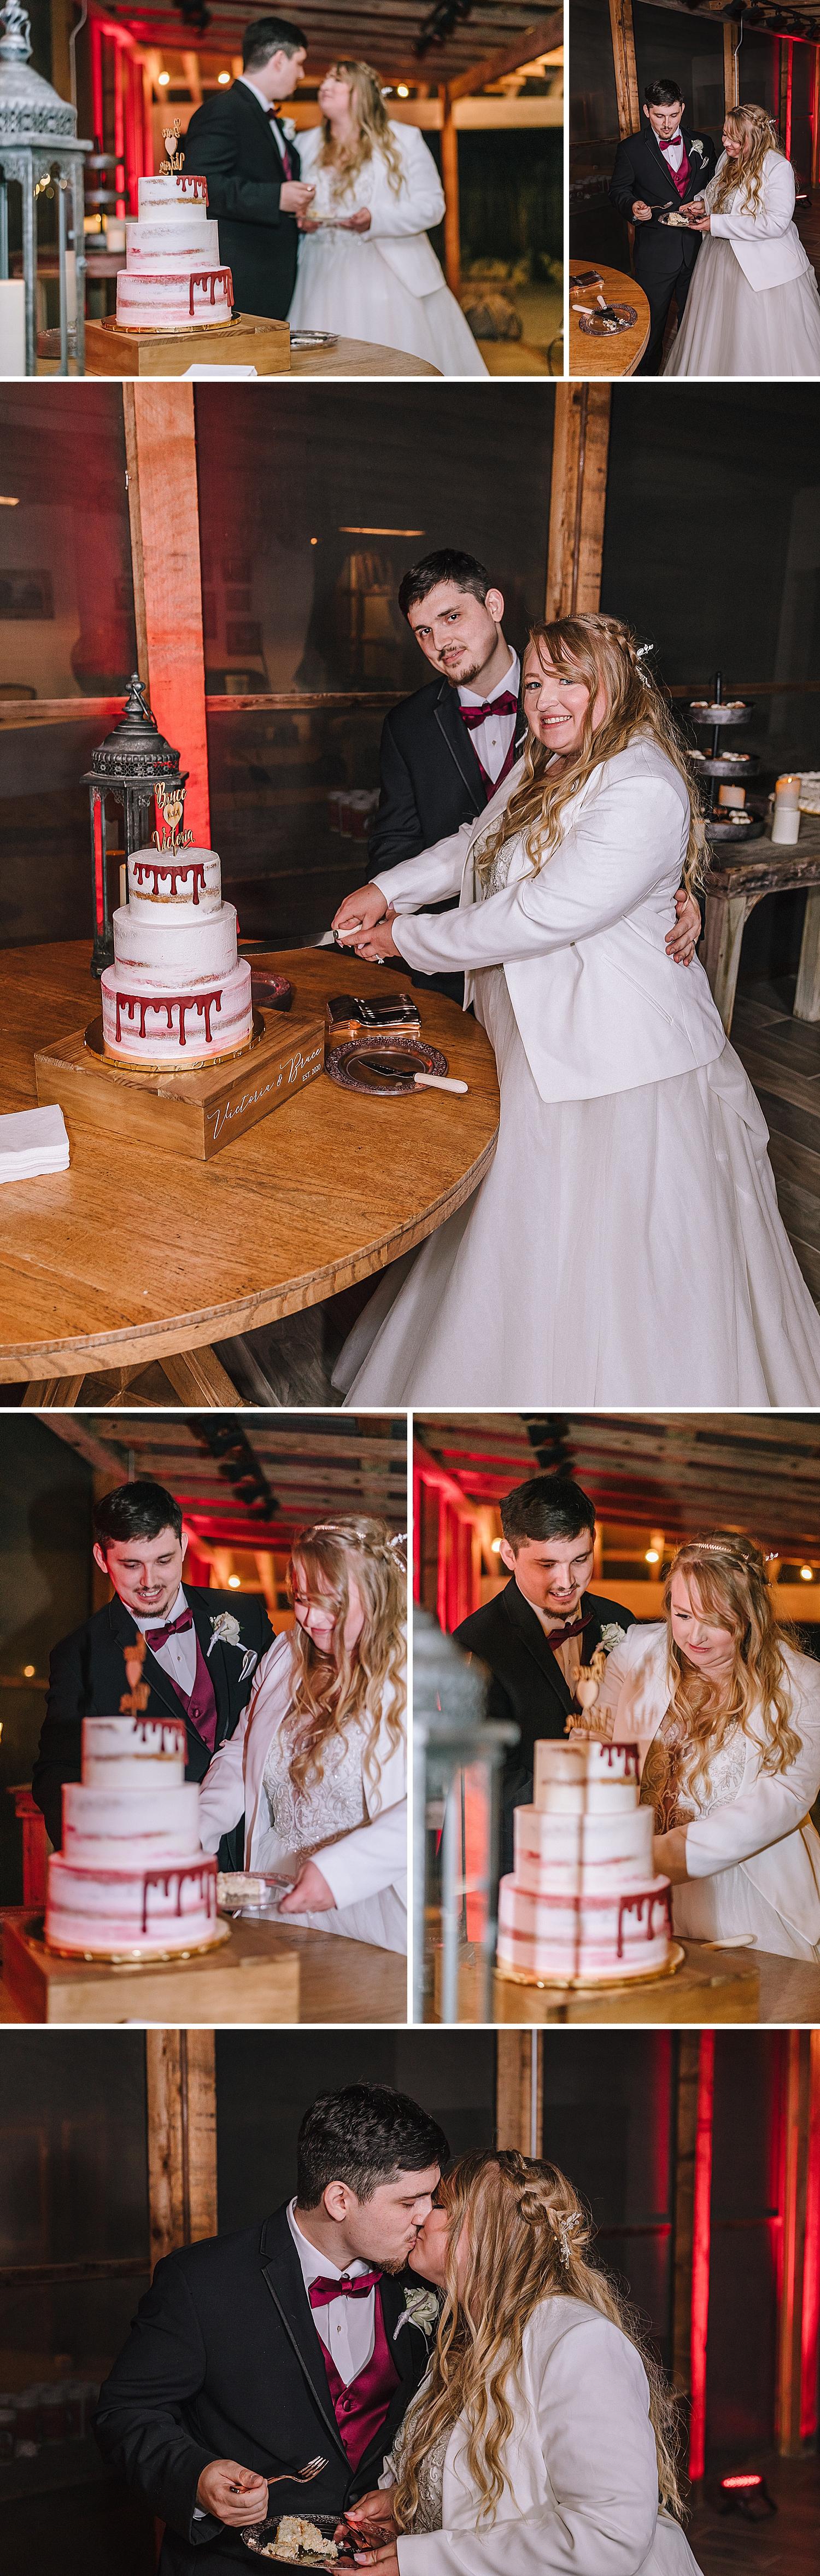 New-Braunfels-Wedding-Photographer-Gruene-Estate-Carly-Barton-Photography_0095.jpg